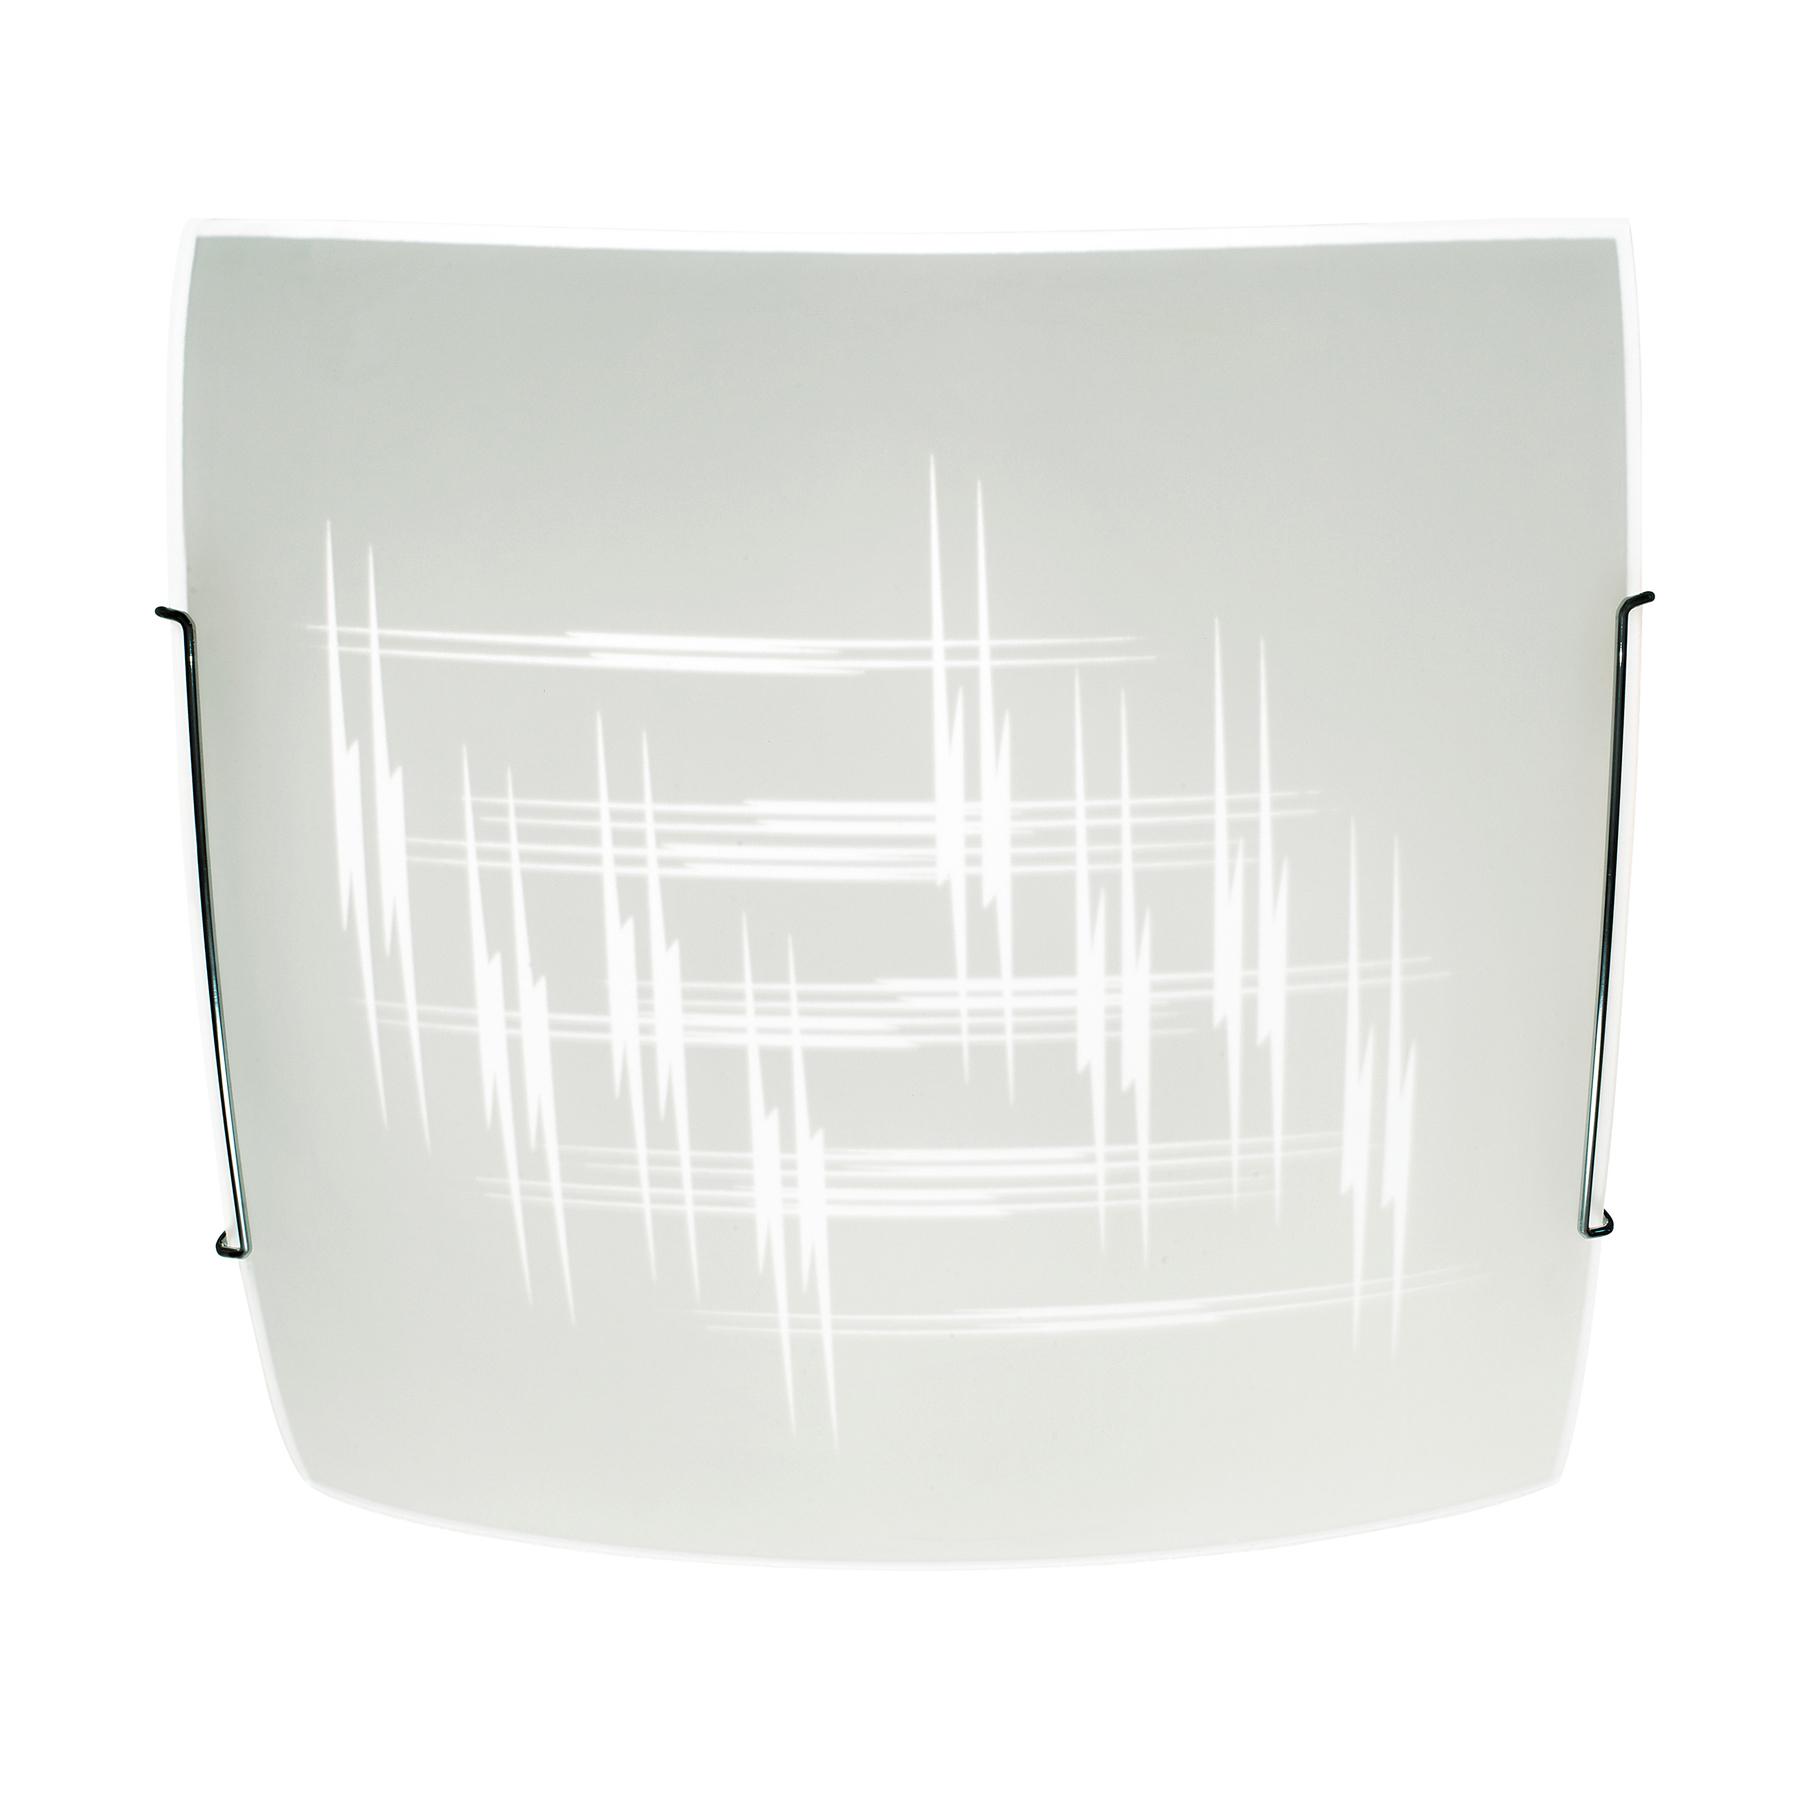 Kattovalaisin Scratch lasista, 40x40cm